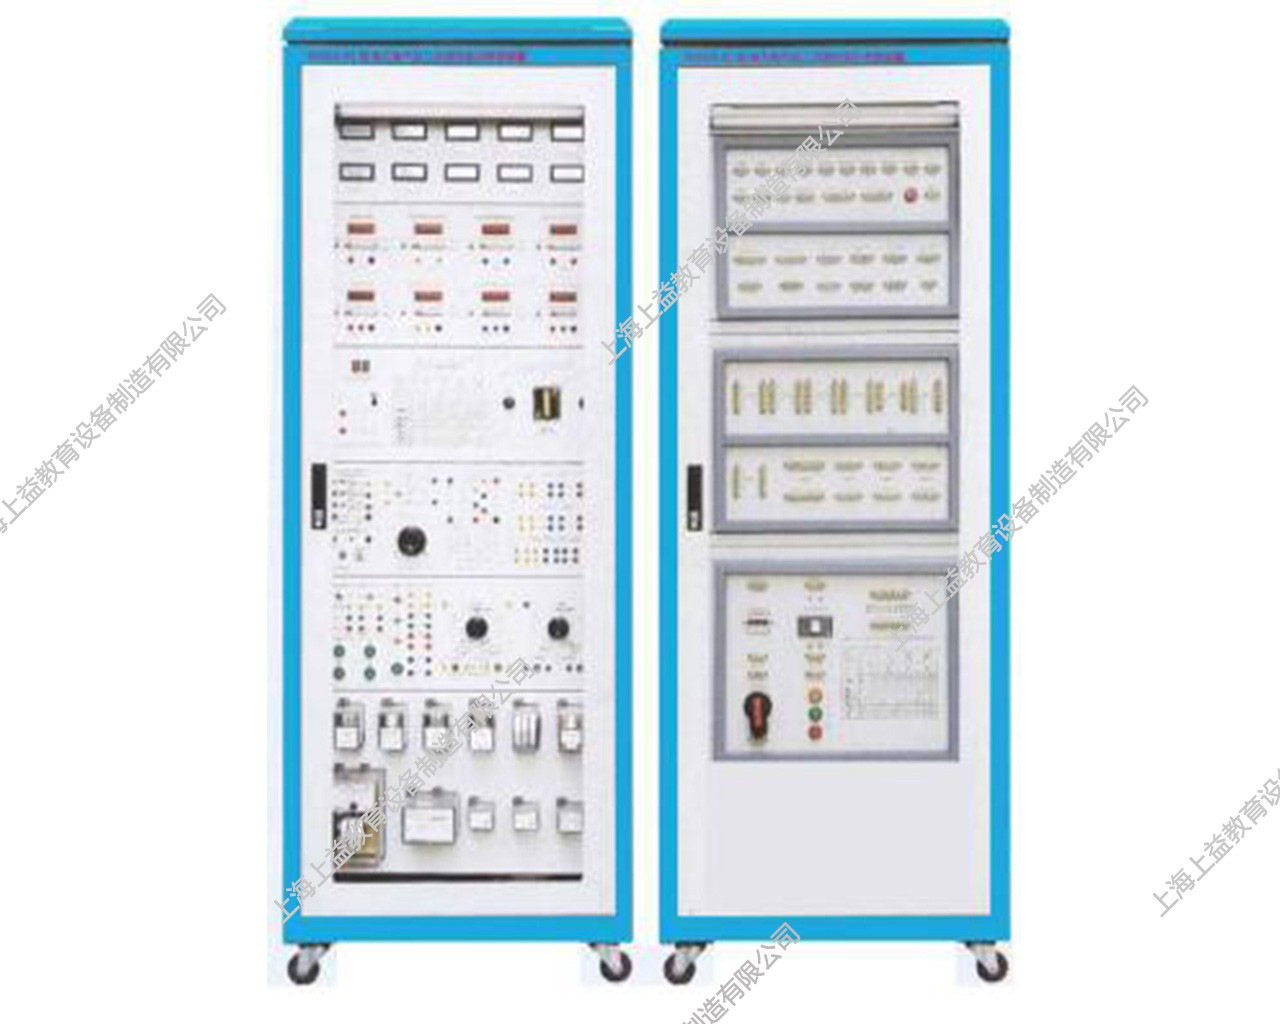 SYDLX-01电力电气及二次部分wwwlehu8viplehu68vip装置 SYDLX-01电力电气及二次部分wwwlehu8viplehu68vip装置 SYDLX-01电力电气及二次部分wwwlehu8viplehu68vip装置